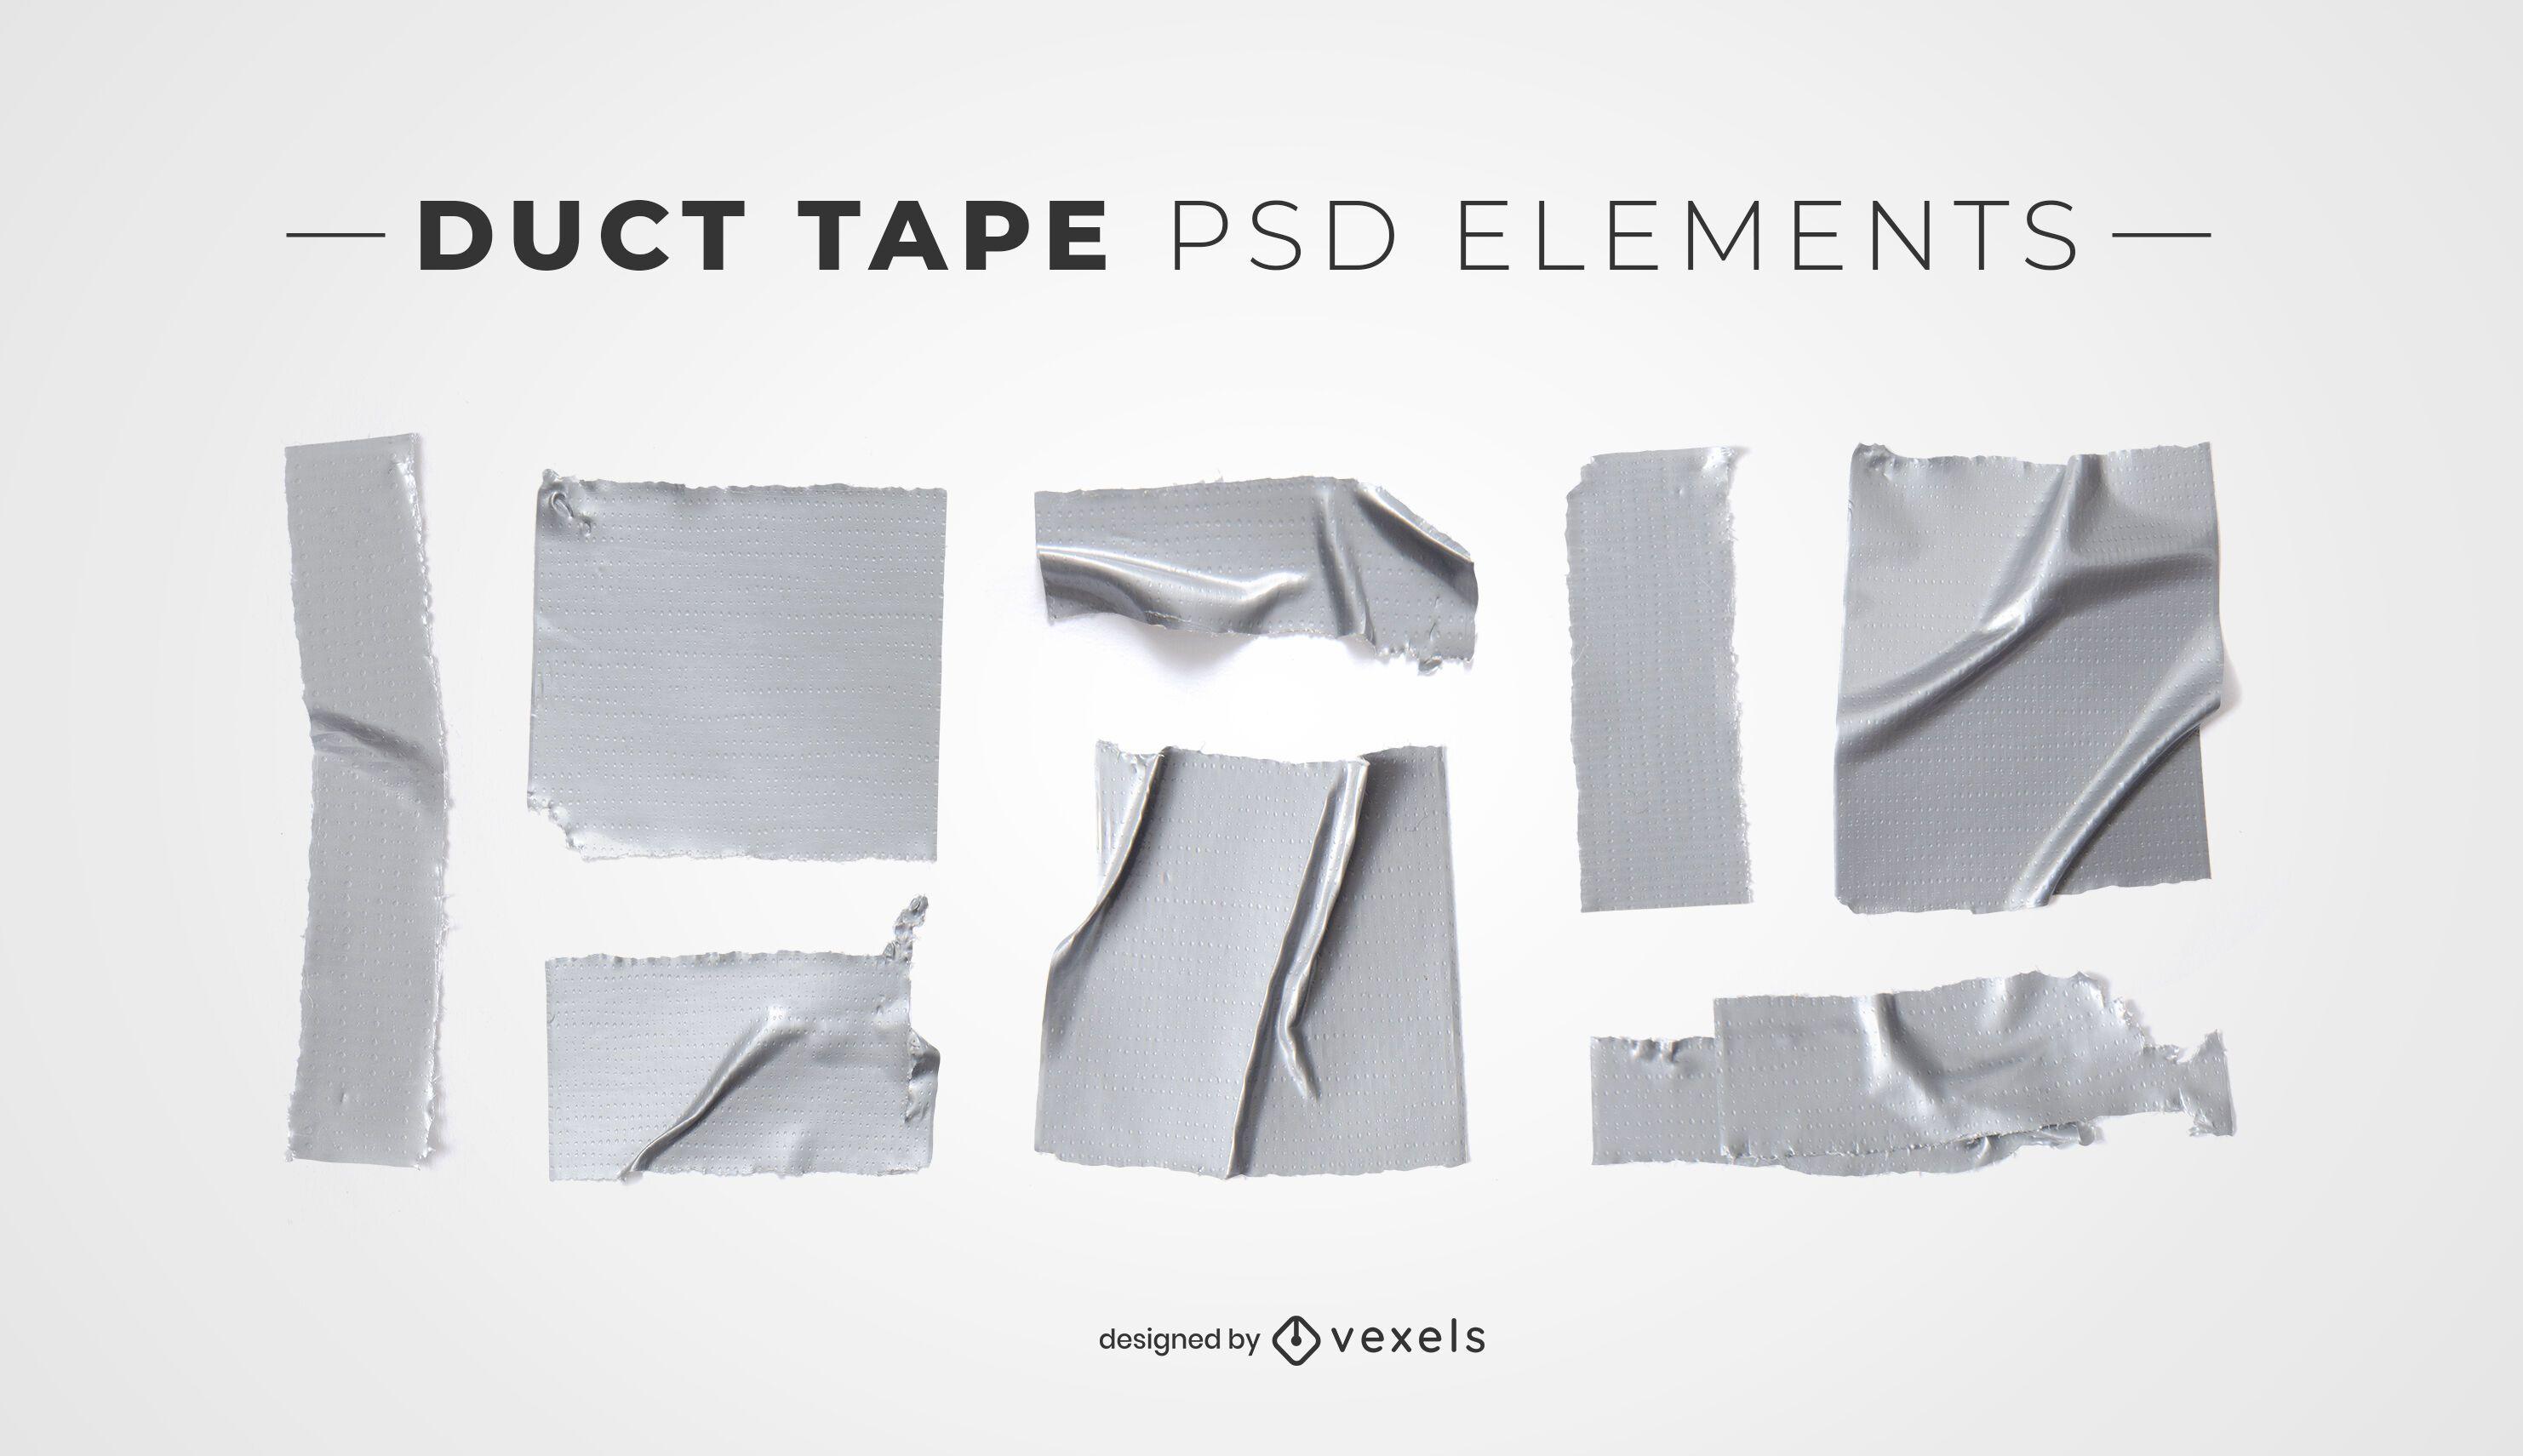 Elementos psd de fita adesiva para maquetes